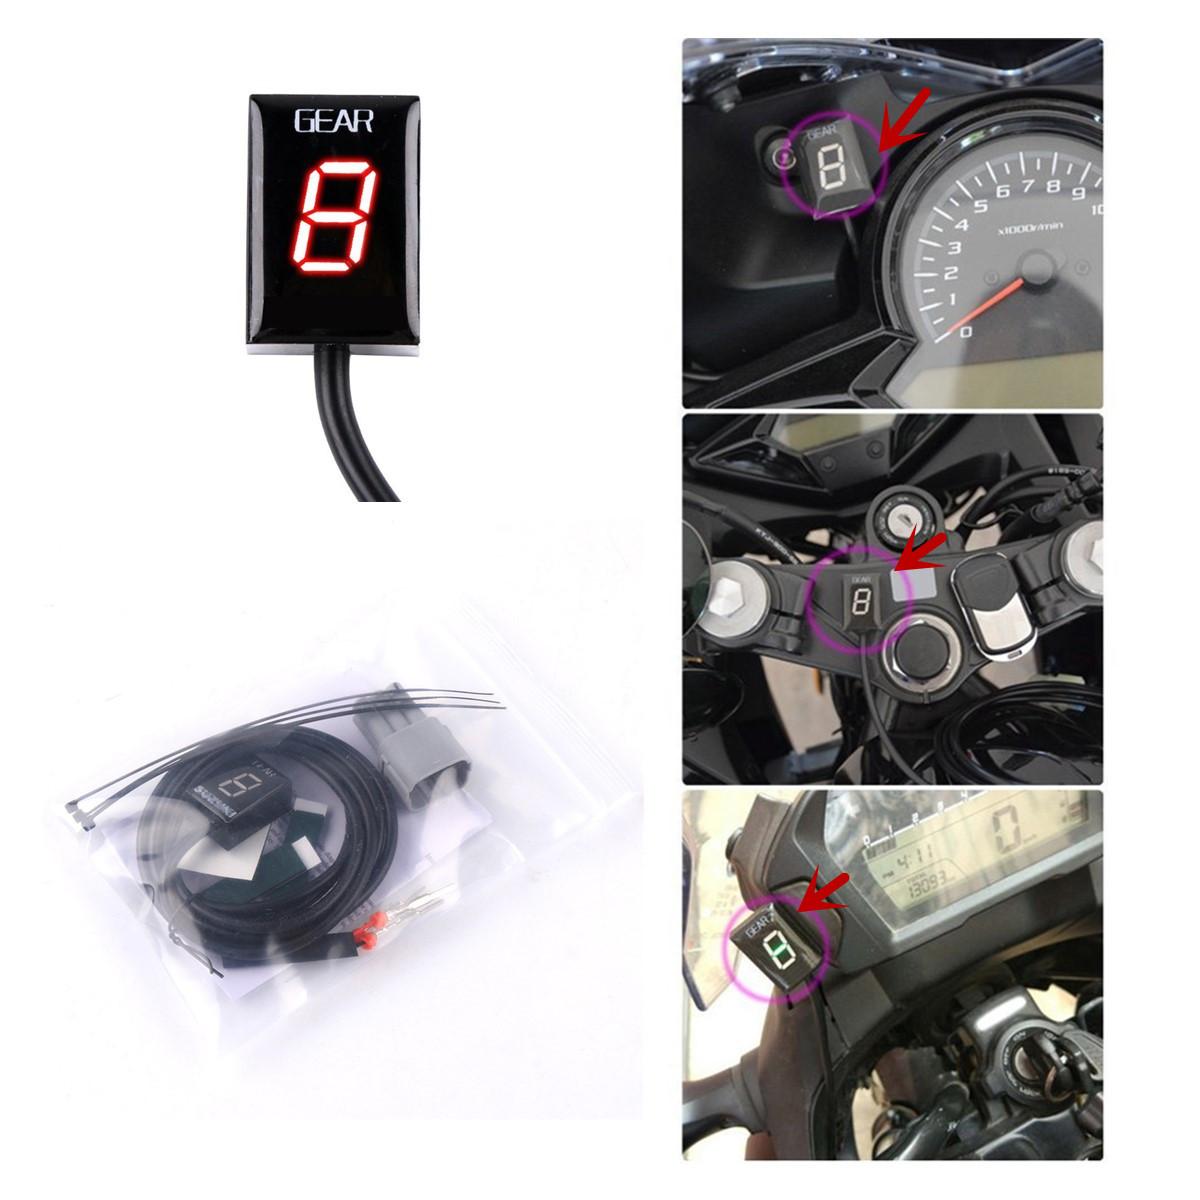 Plug and Play gear indicator 2003-2009 FOR SUZUKI  SV1000